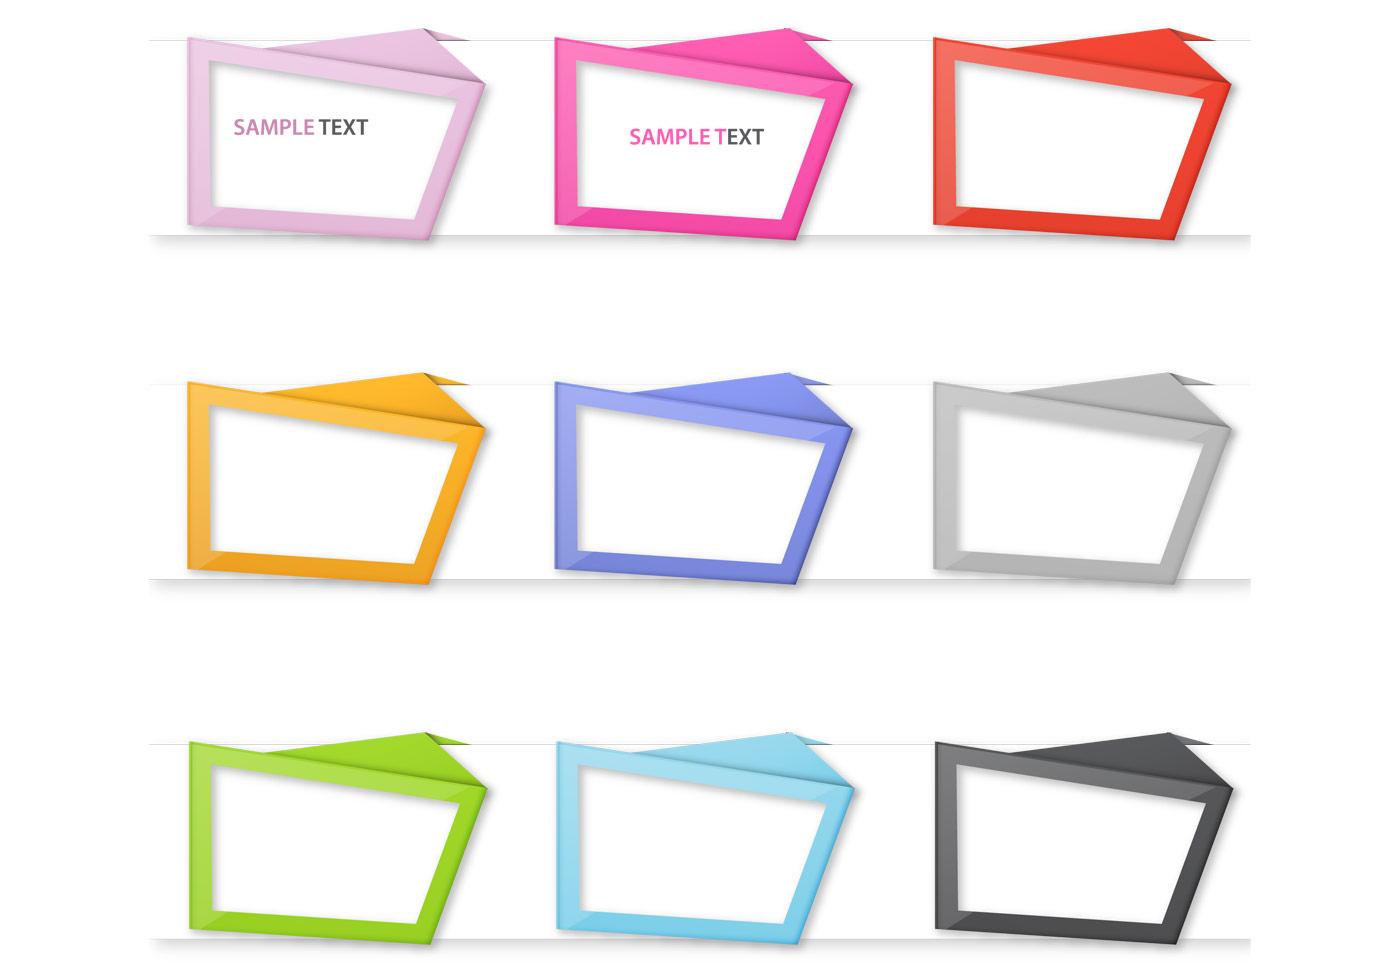 Origami Rahmen PSD Pack - Kostenlose Photoshop-Pinsel bei Brusheezy!